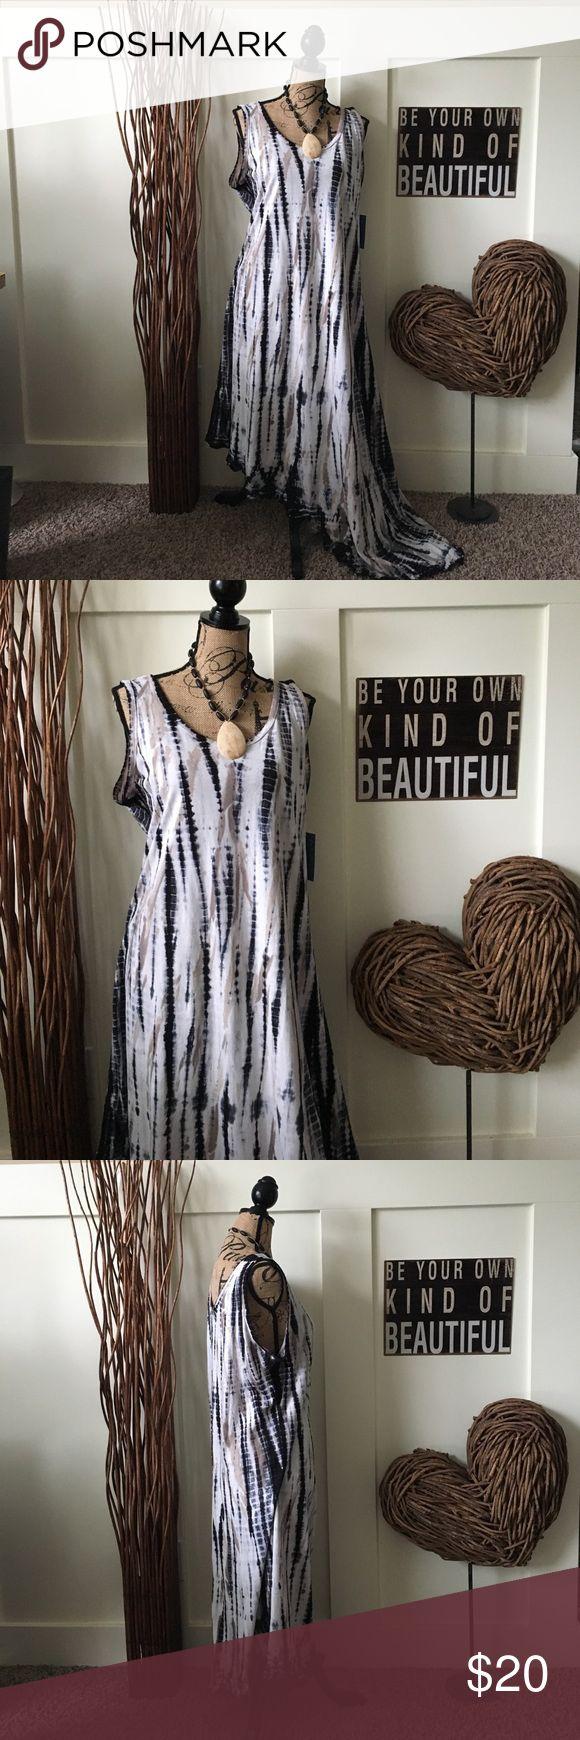 Lulu-B, asymmetrical tie dye dress Cream khaki and black tie-dye dress has an asymmetrical longer side. Super cute with your favorite flip-flops or dress it up with your favorite heels for a night out. lula b Dresses Asymmetrical